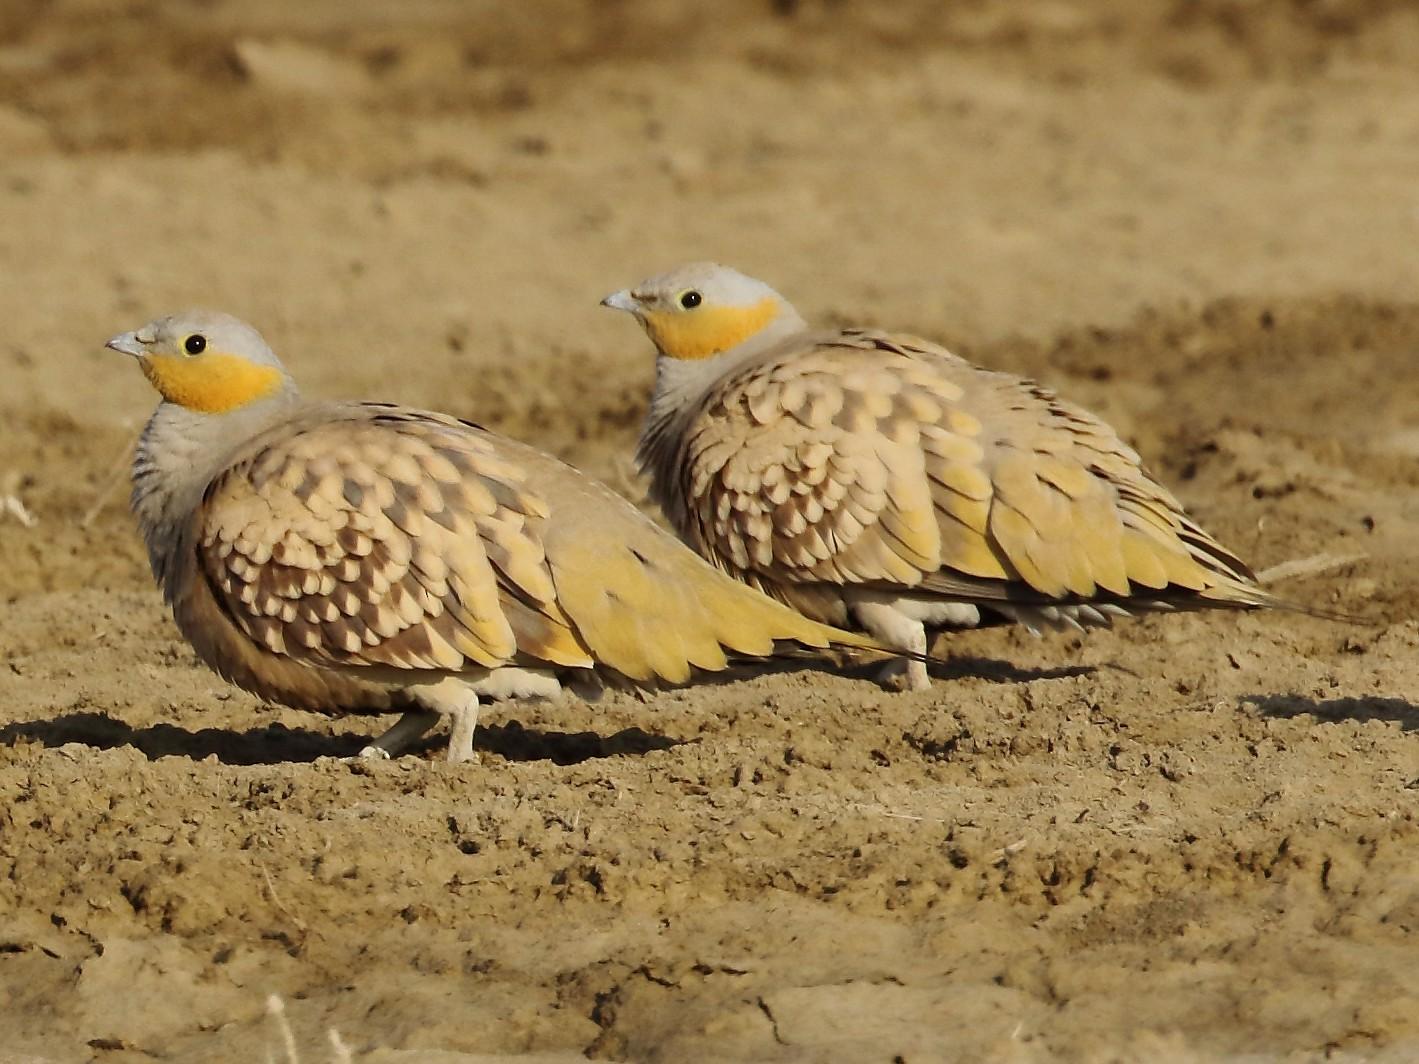 Spotted Sandgrouse - Rahul  Singh